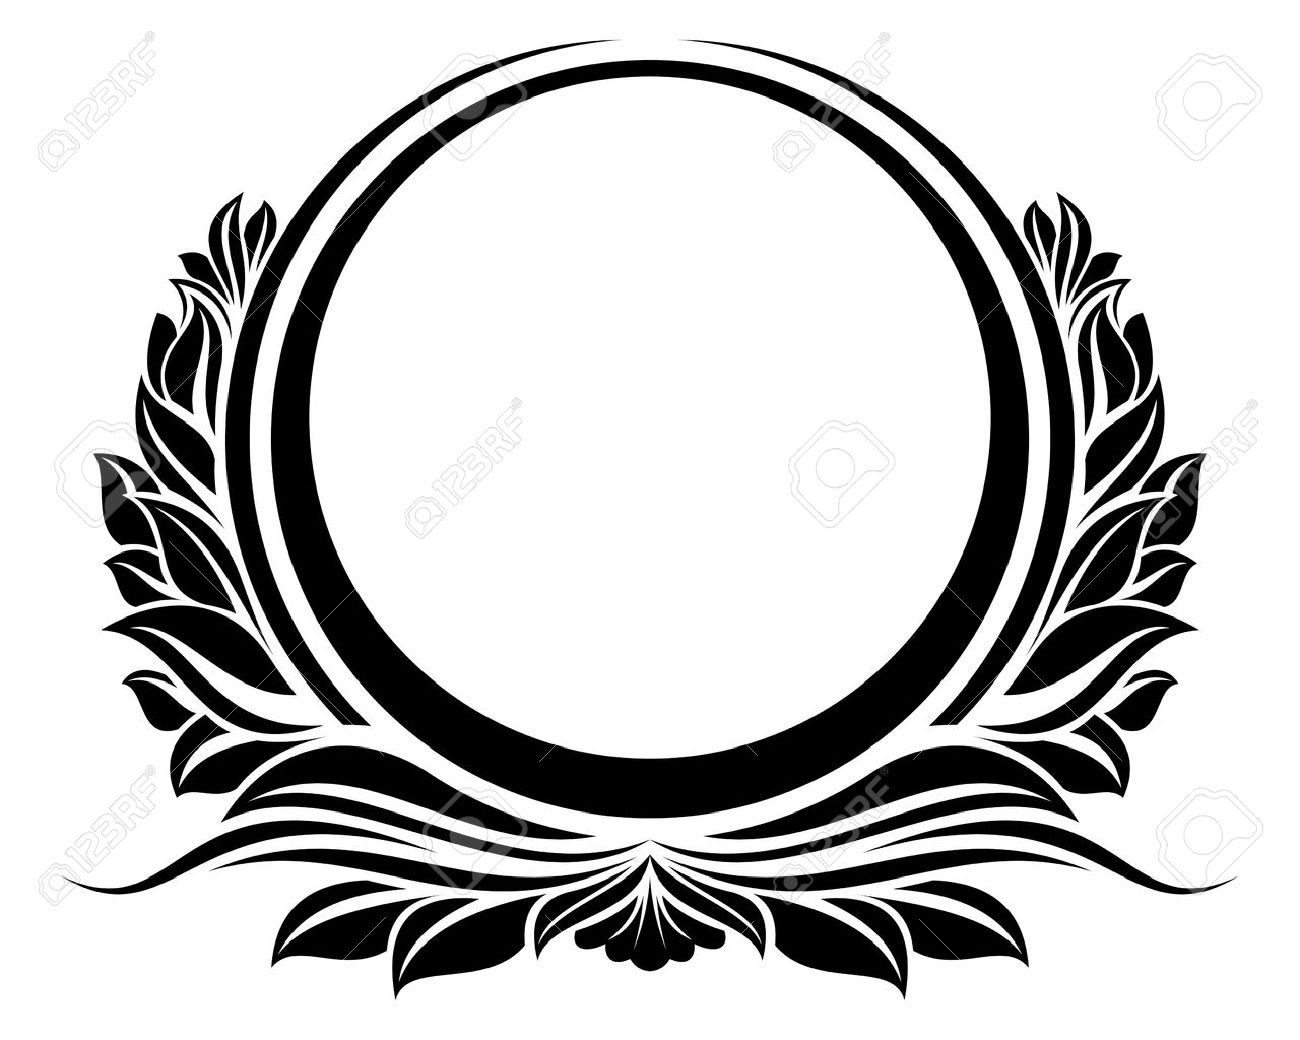 Black Circle Frame Royalty Free Cliparts, Vectors, And Stock ...